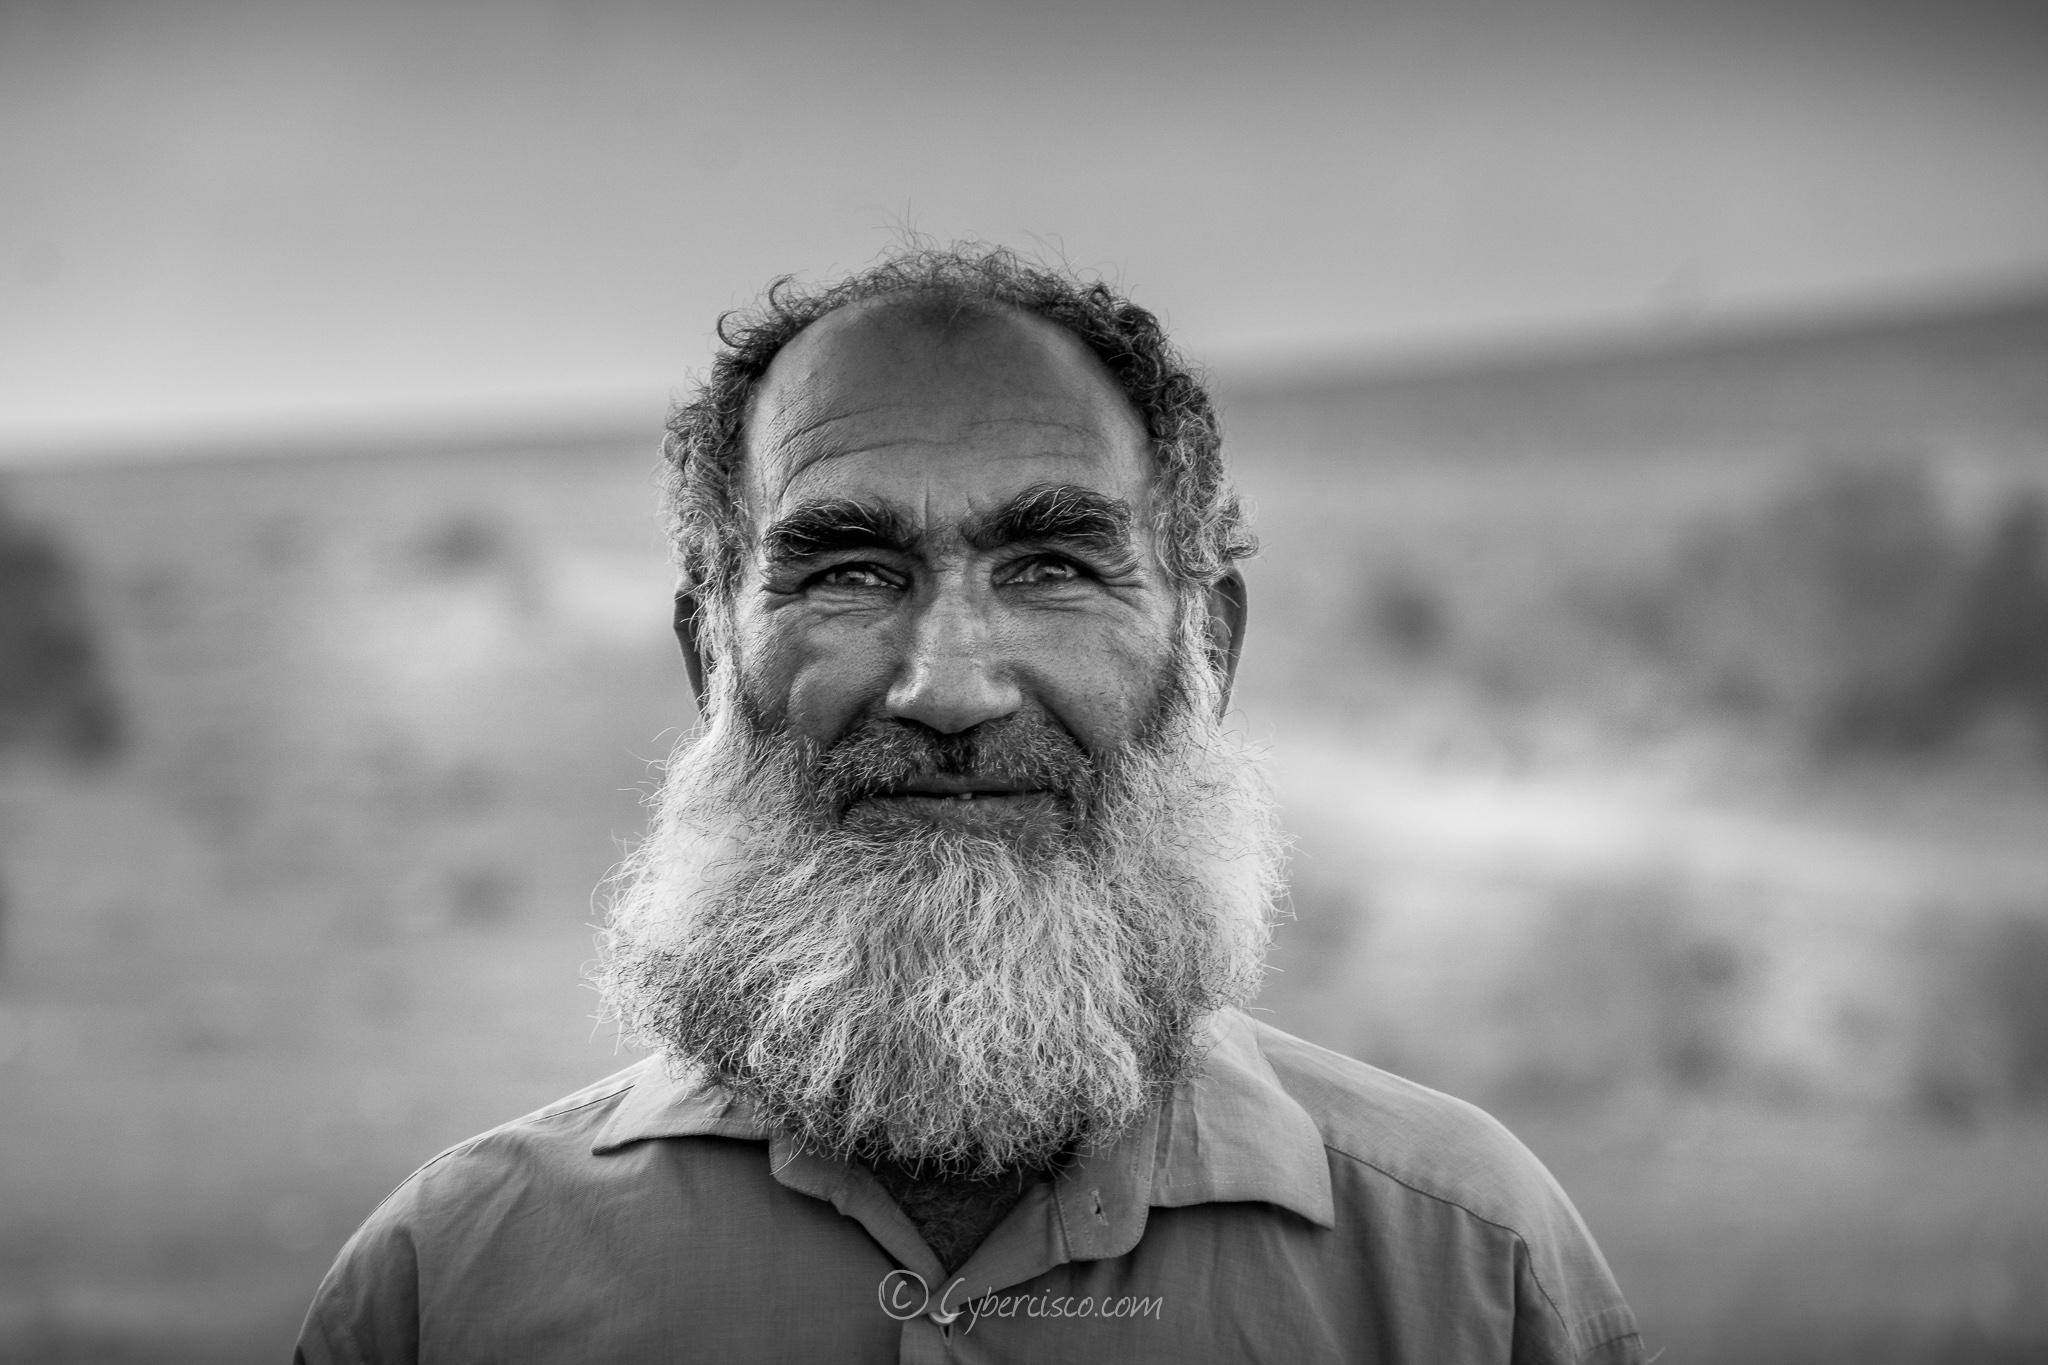 Afghan man working in Iran